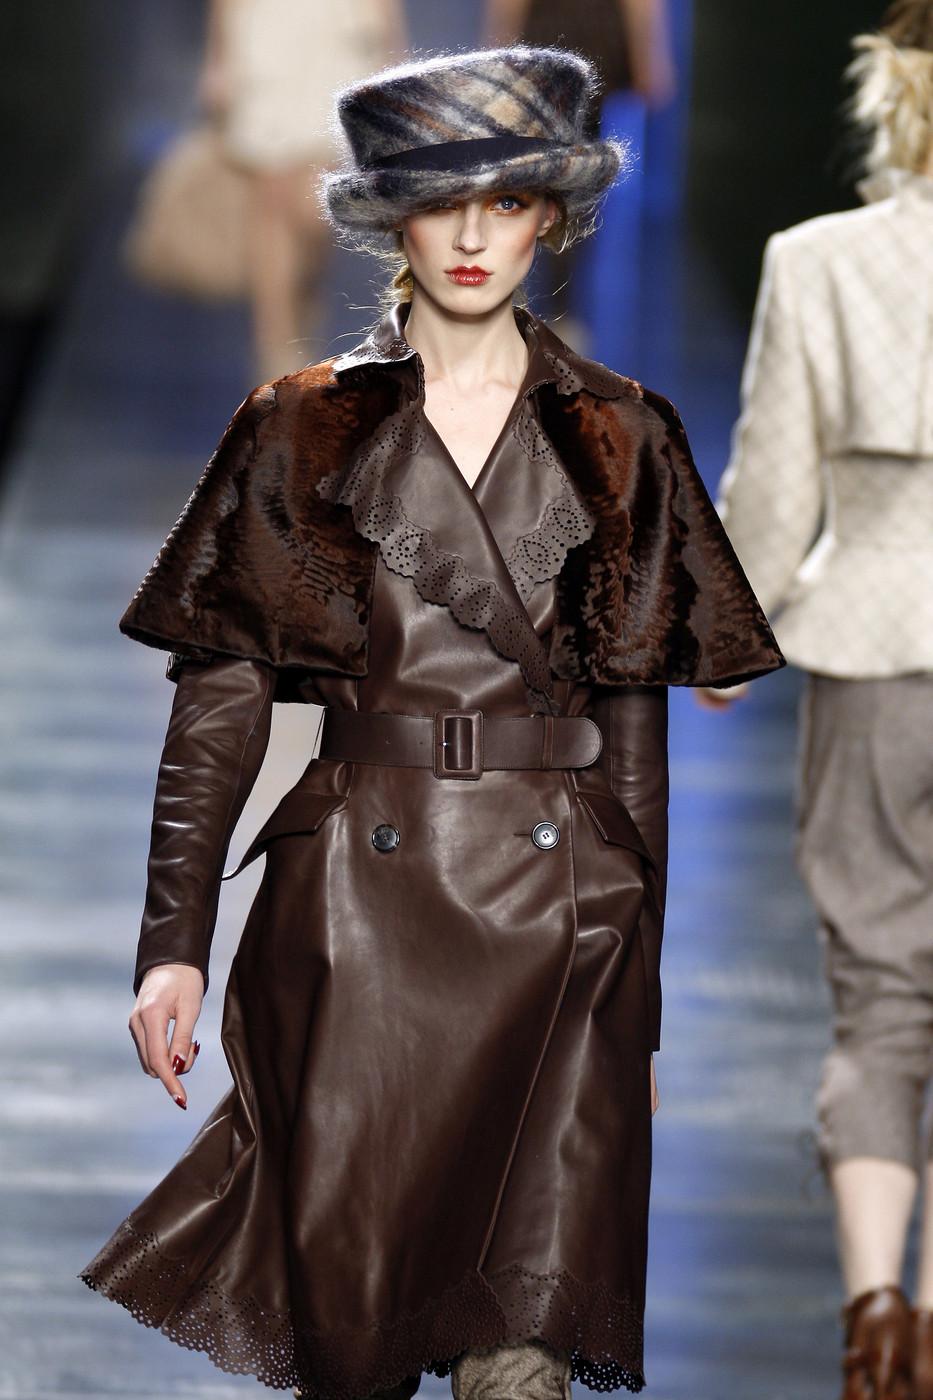 Christian Dior Fall/Winter 2010